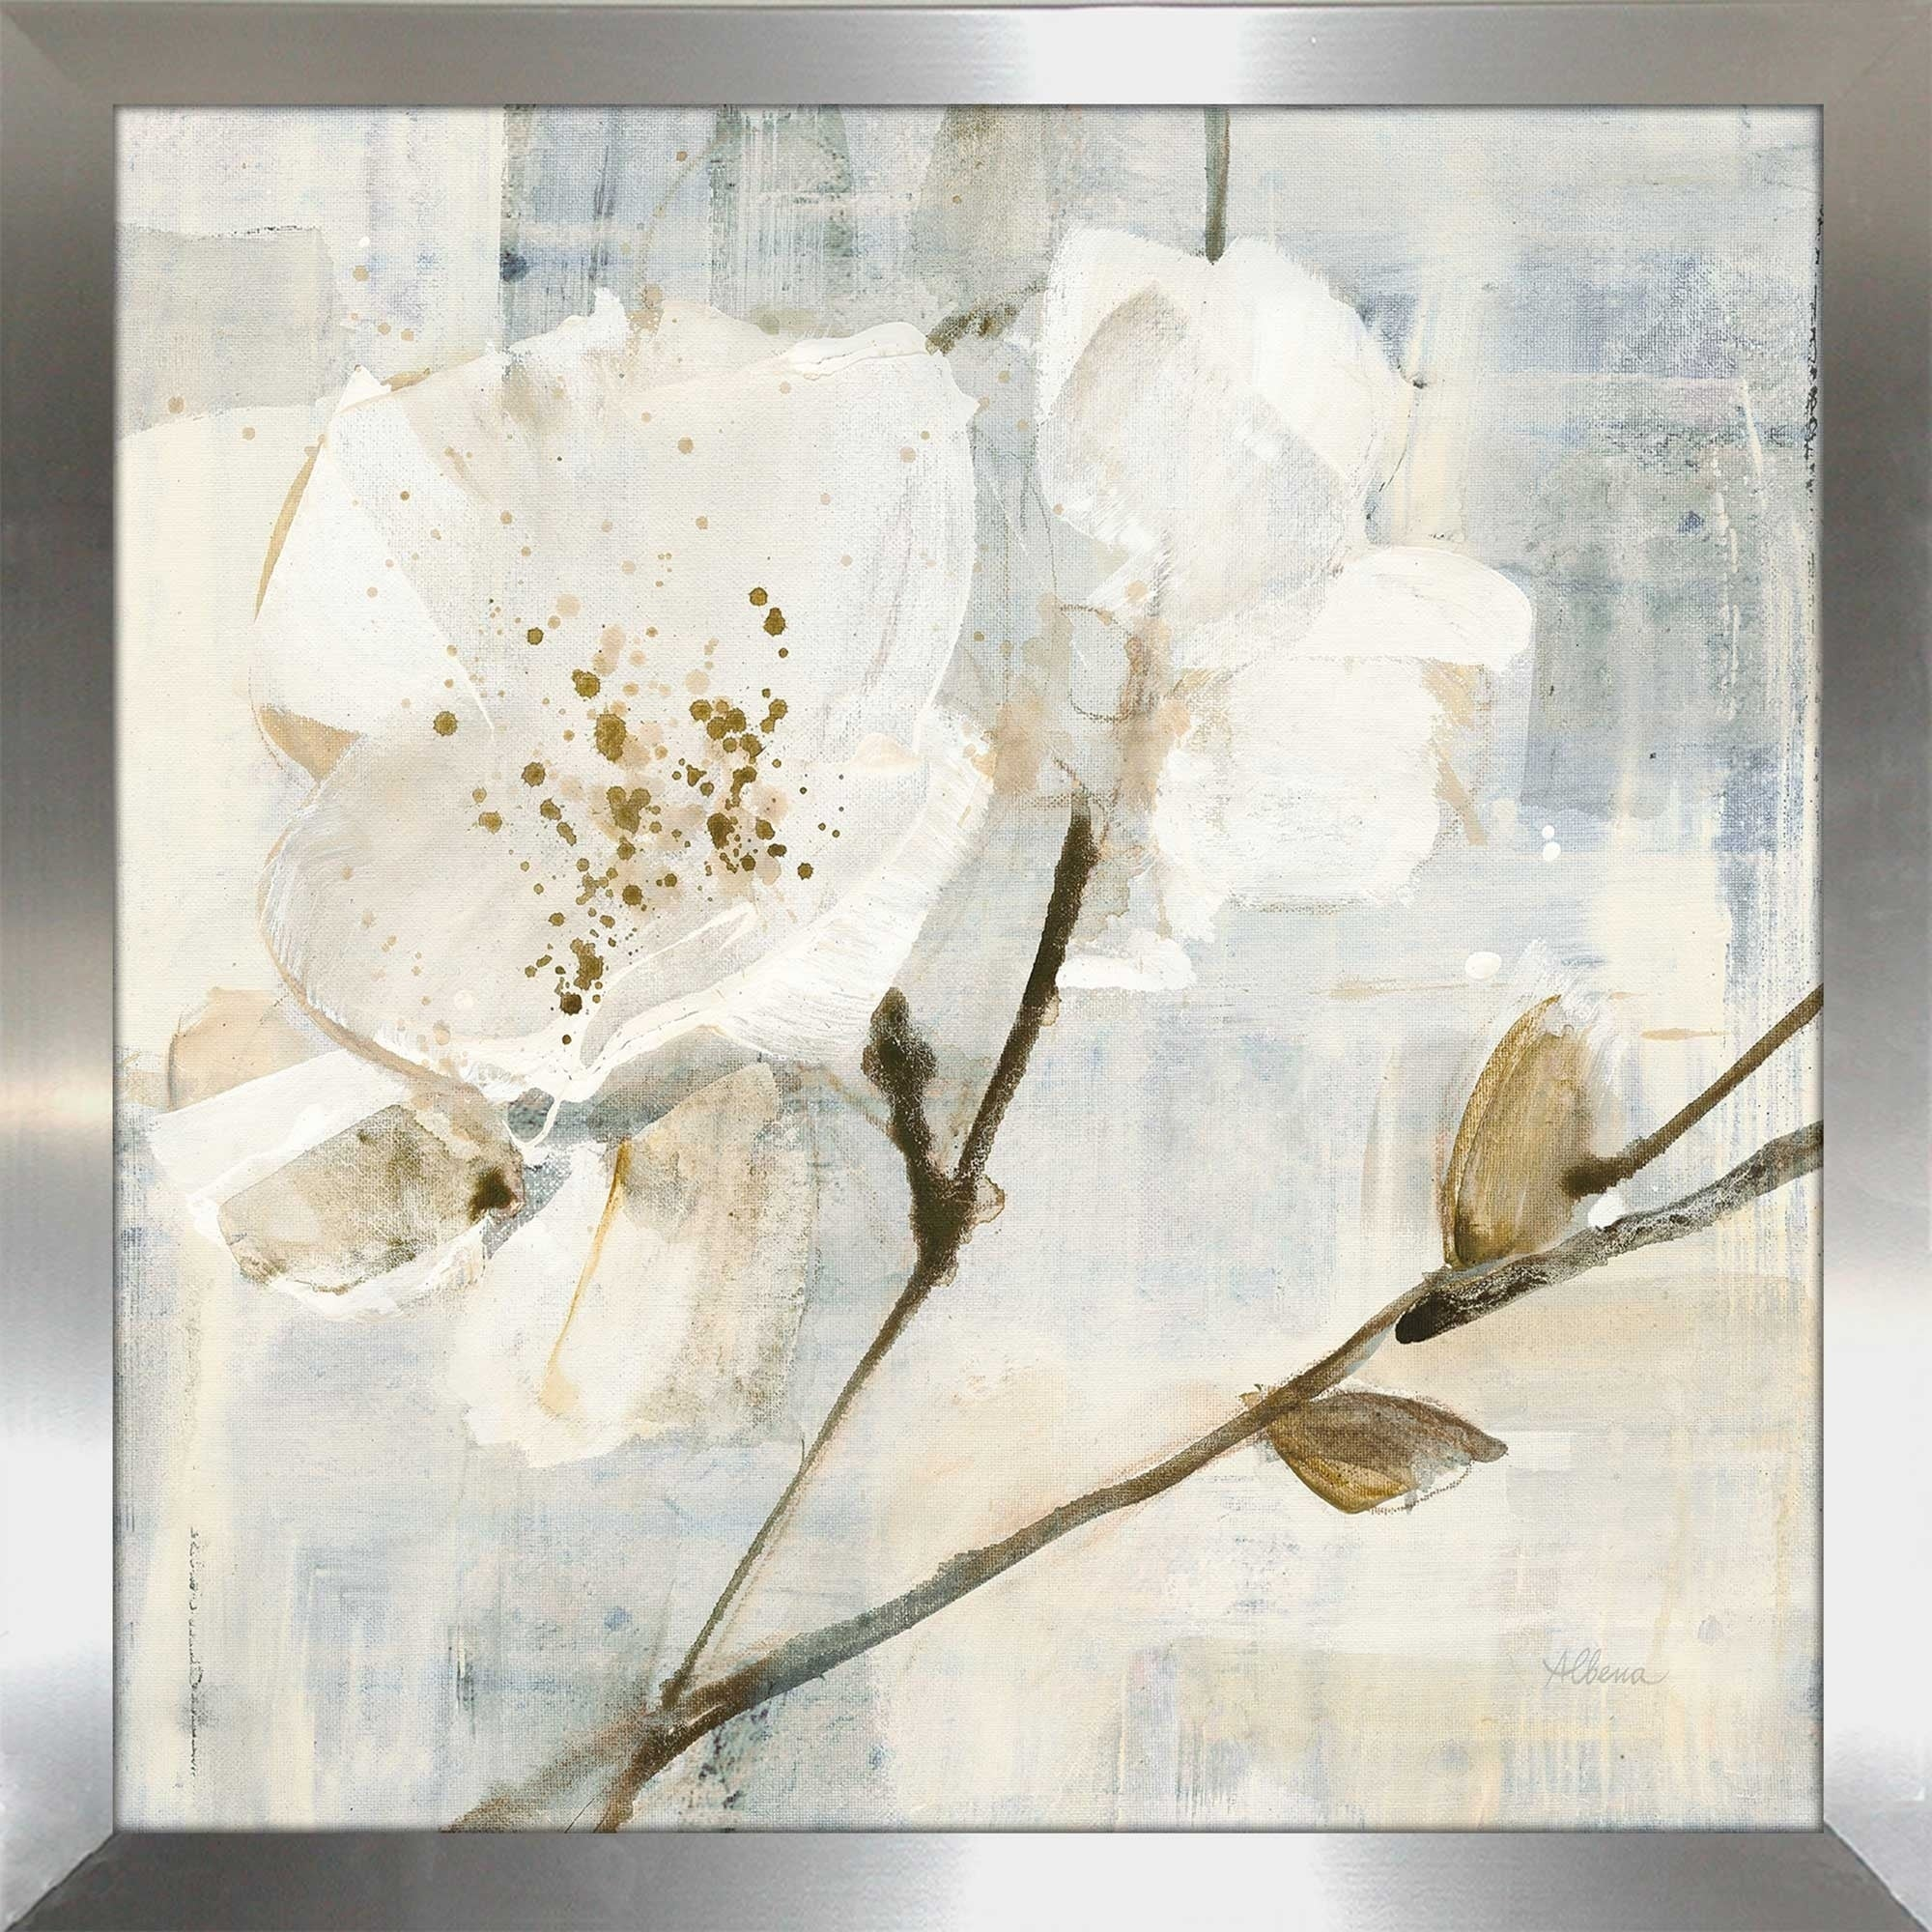 Albena Hristova Elegance I Greige Framed Plexiglass Wall Art Overstock 20468236